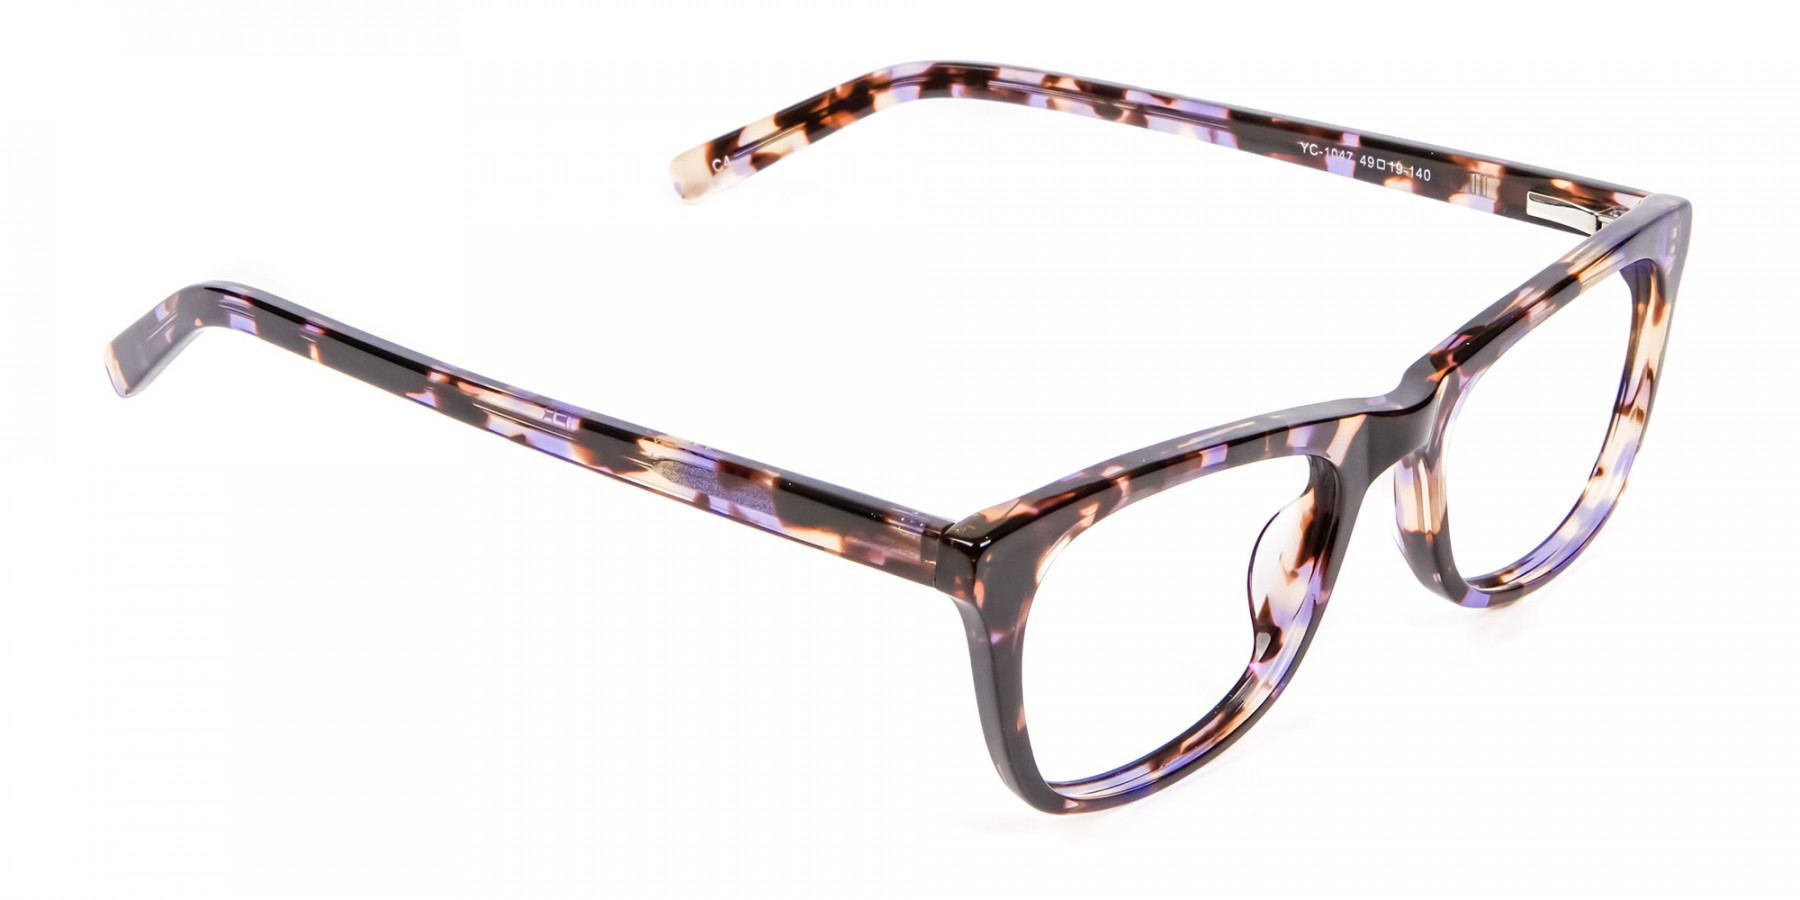 Neutral Frame in Tortoiseshell and Purple